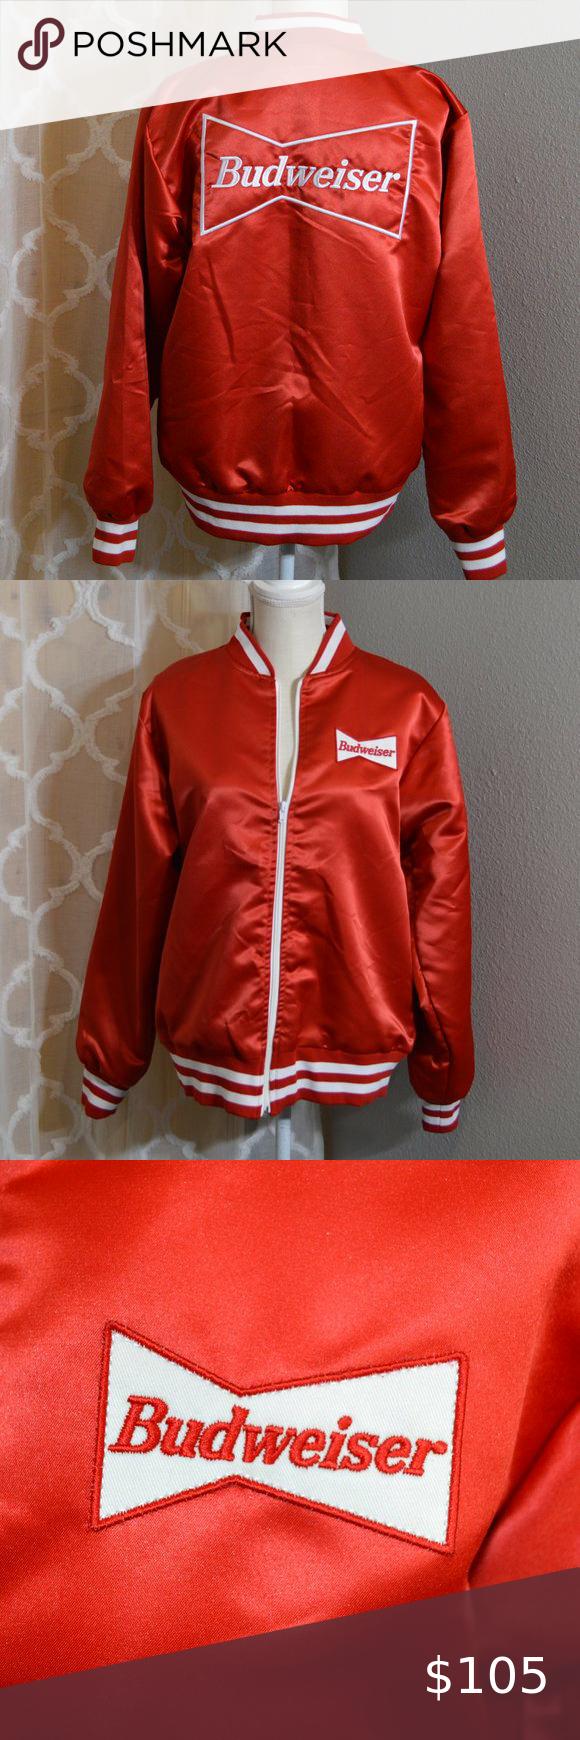 Vintage 1980s Budweiser Red Satin Bomber Jacket Bomber Jacket Vintage Satin Bomber Jacket Mens Leather Bomber Jacket [ 1740 x 580 Pixel ]